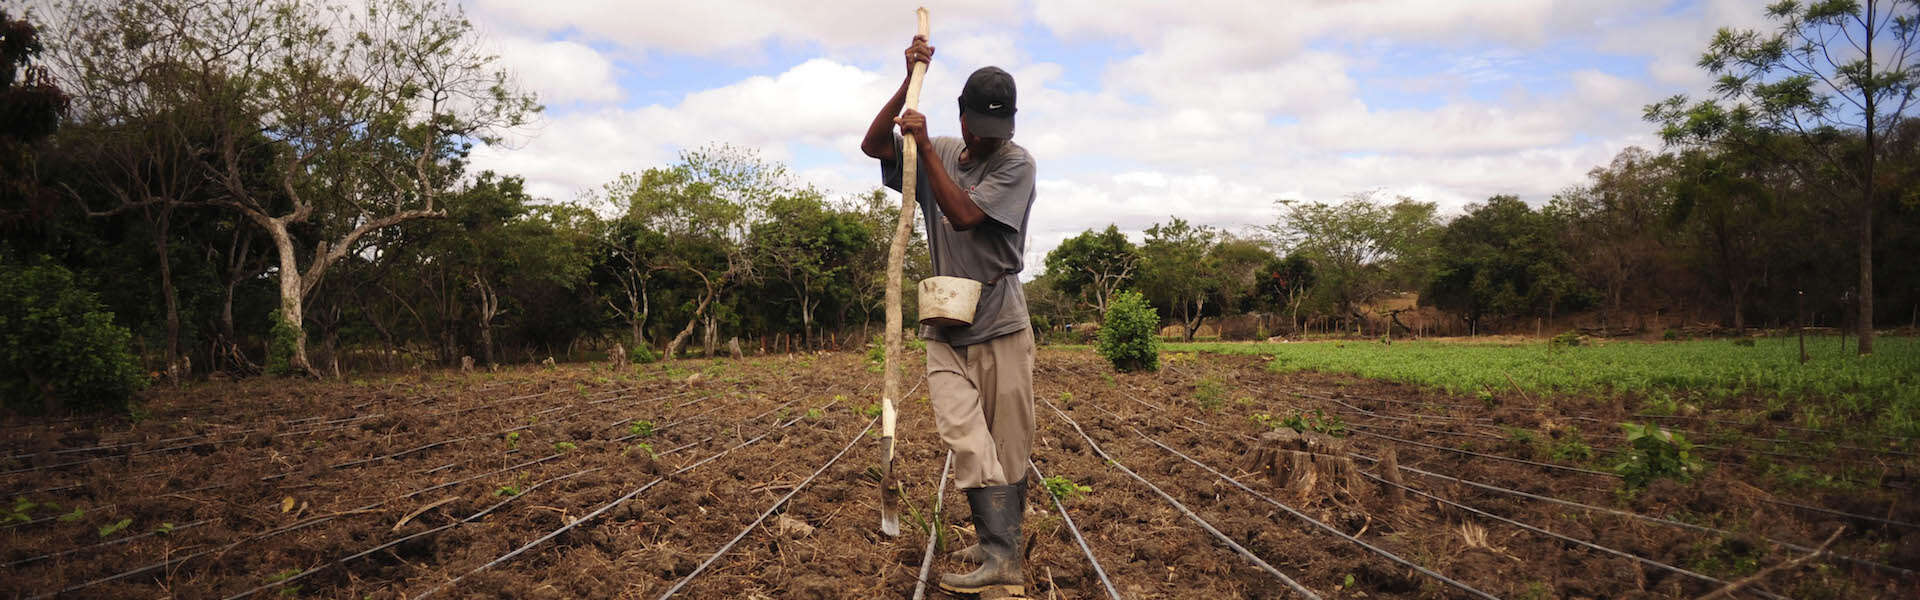 A New Era of Farming: Unlocking Innovations for Smallholders Via Non-Traditional Finance, on NextBillion.net